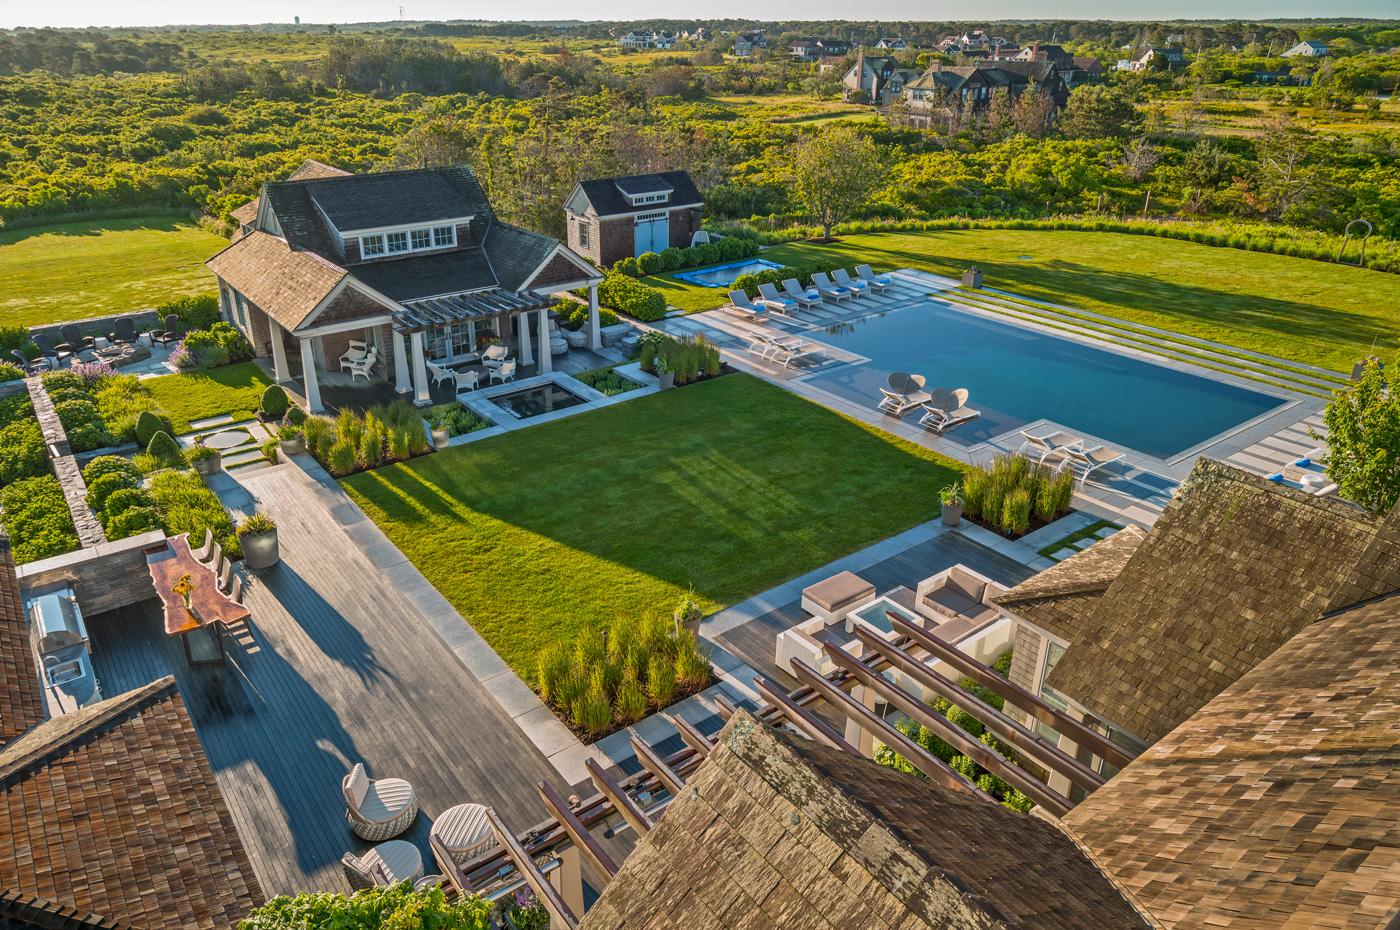 Nantucket Outdoor Landscape Program by Gregory Lombardi Design